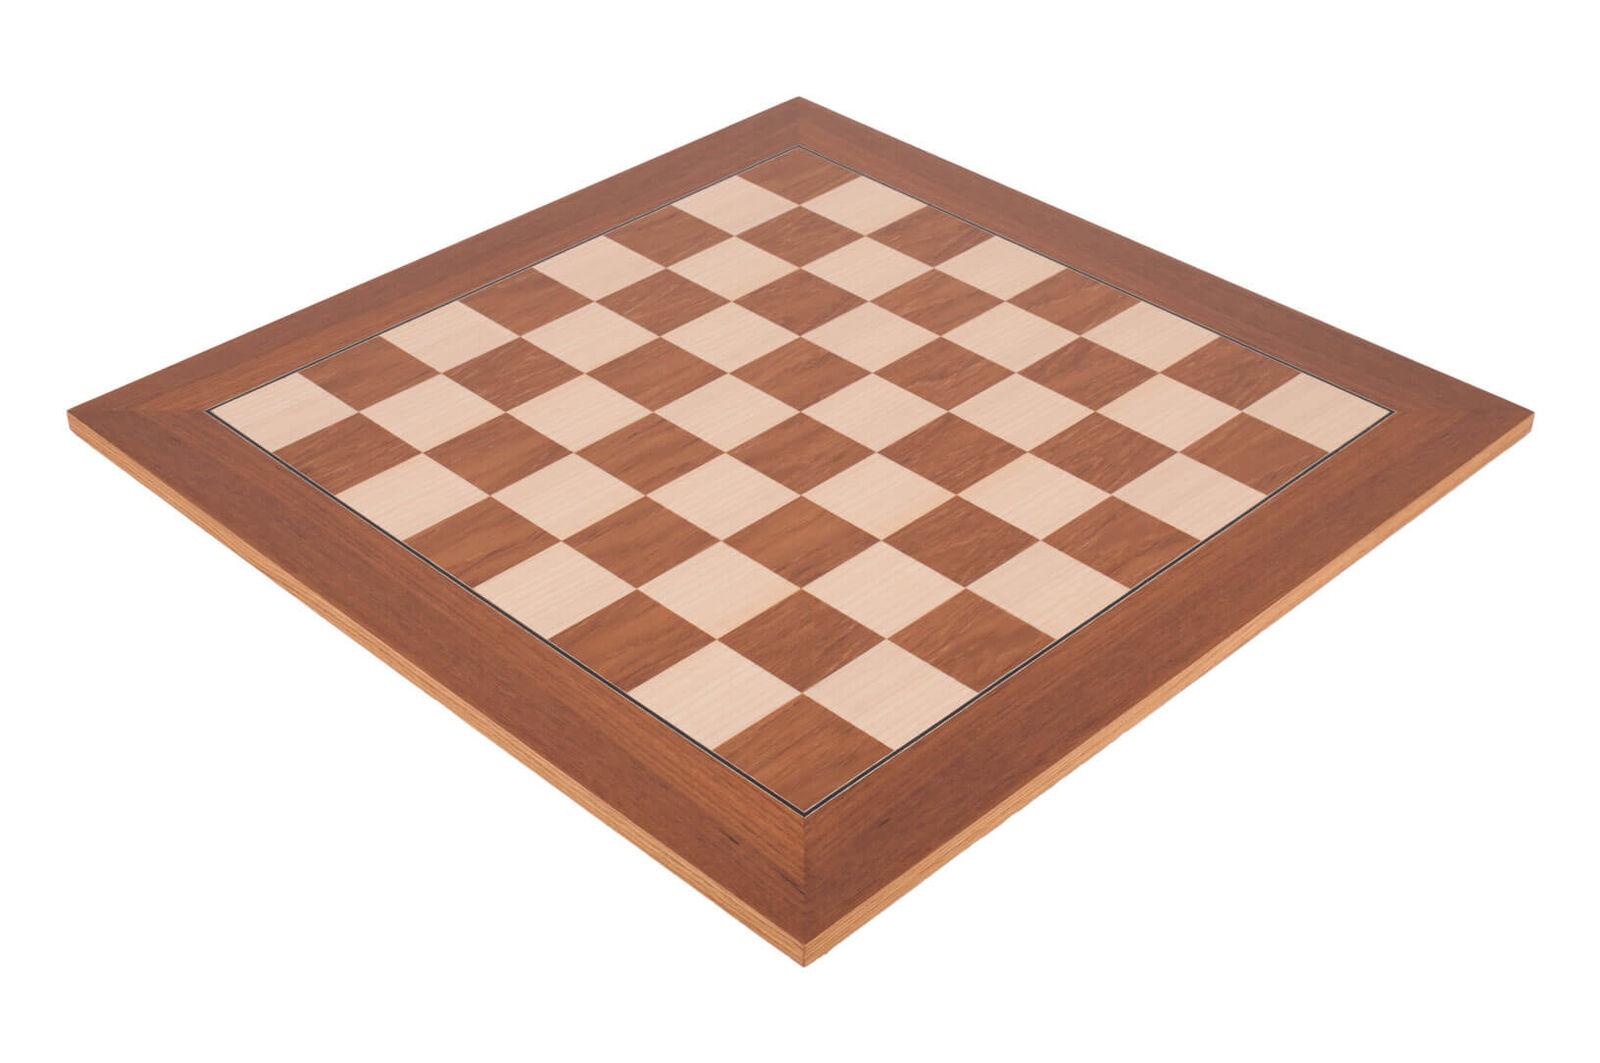 Teak Standard Traditional Chess Board - 2.25